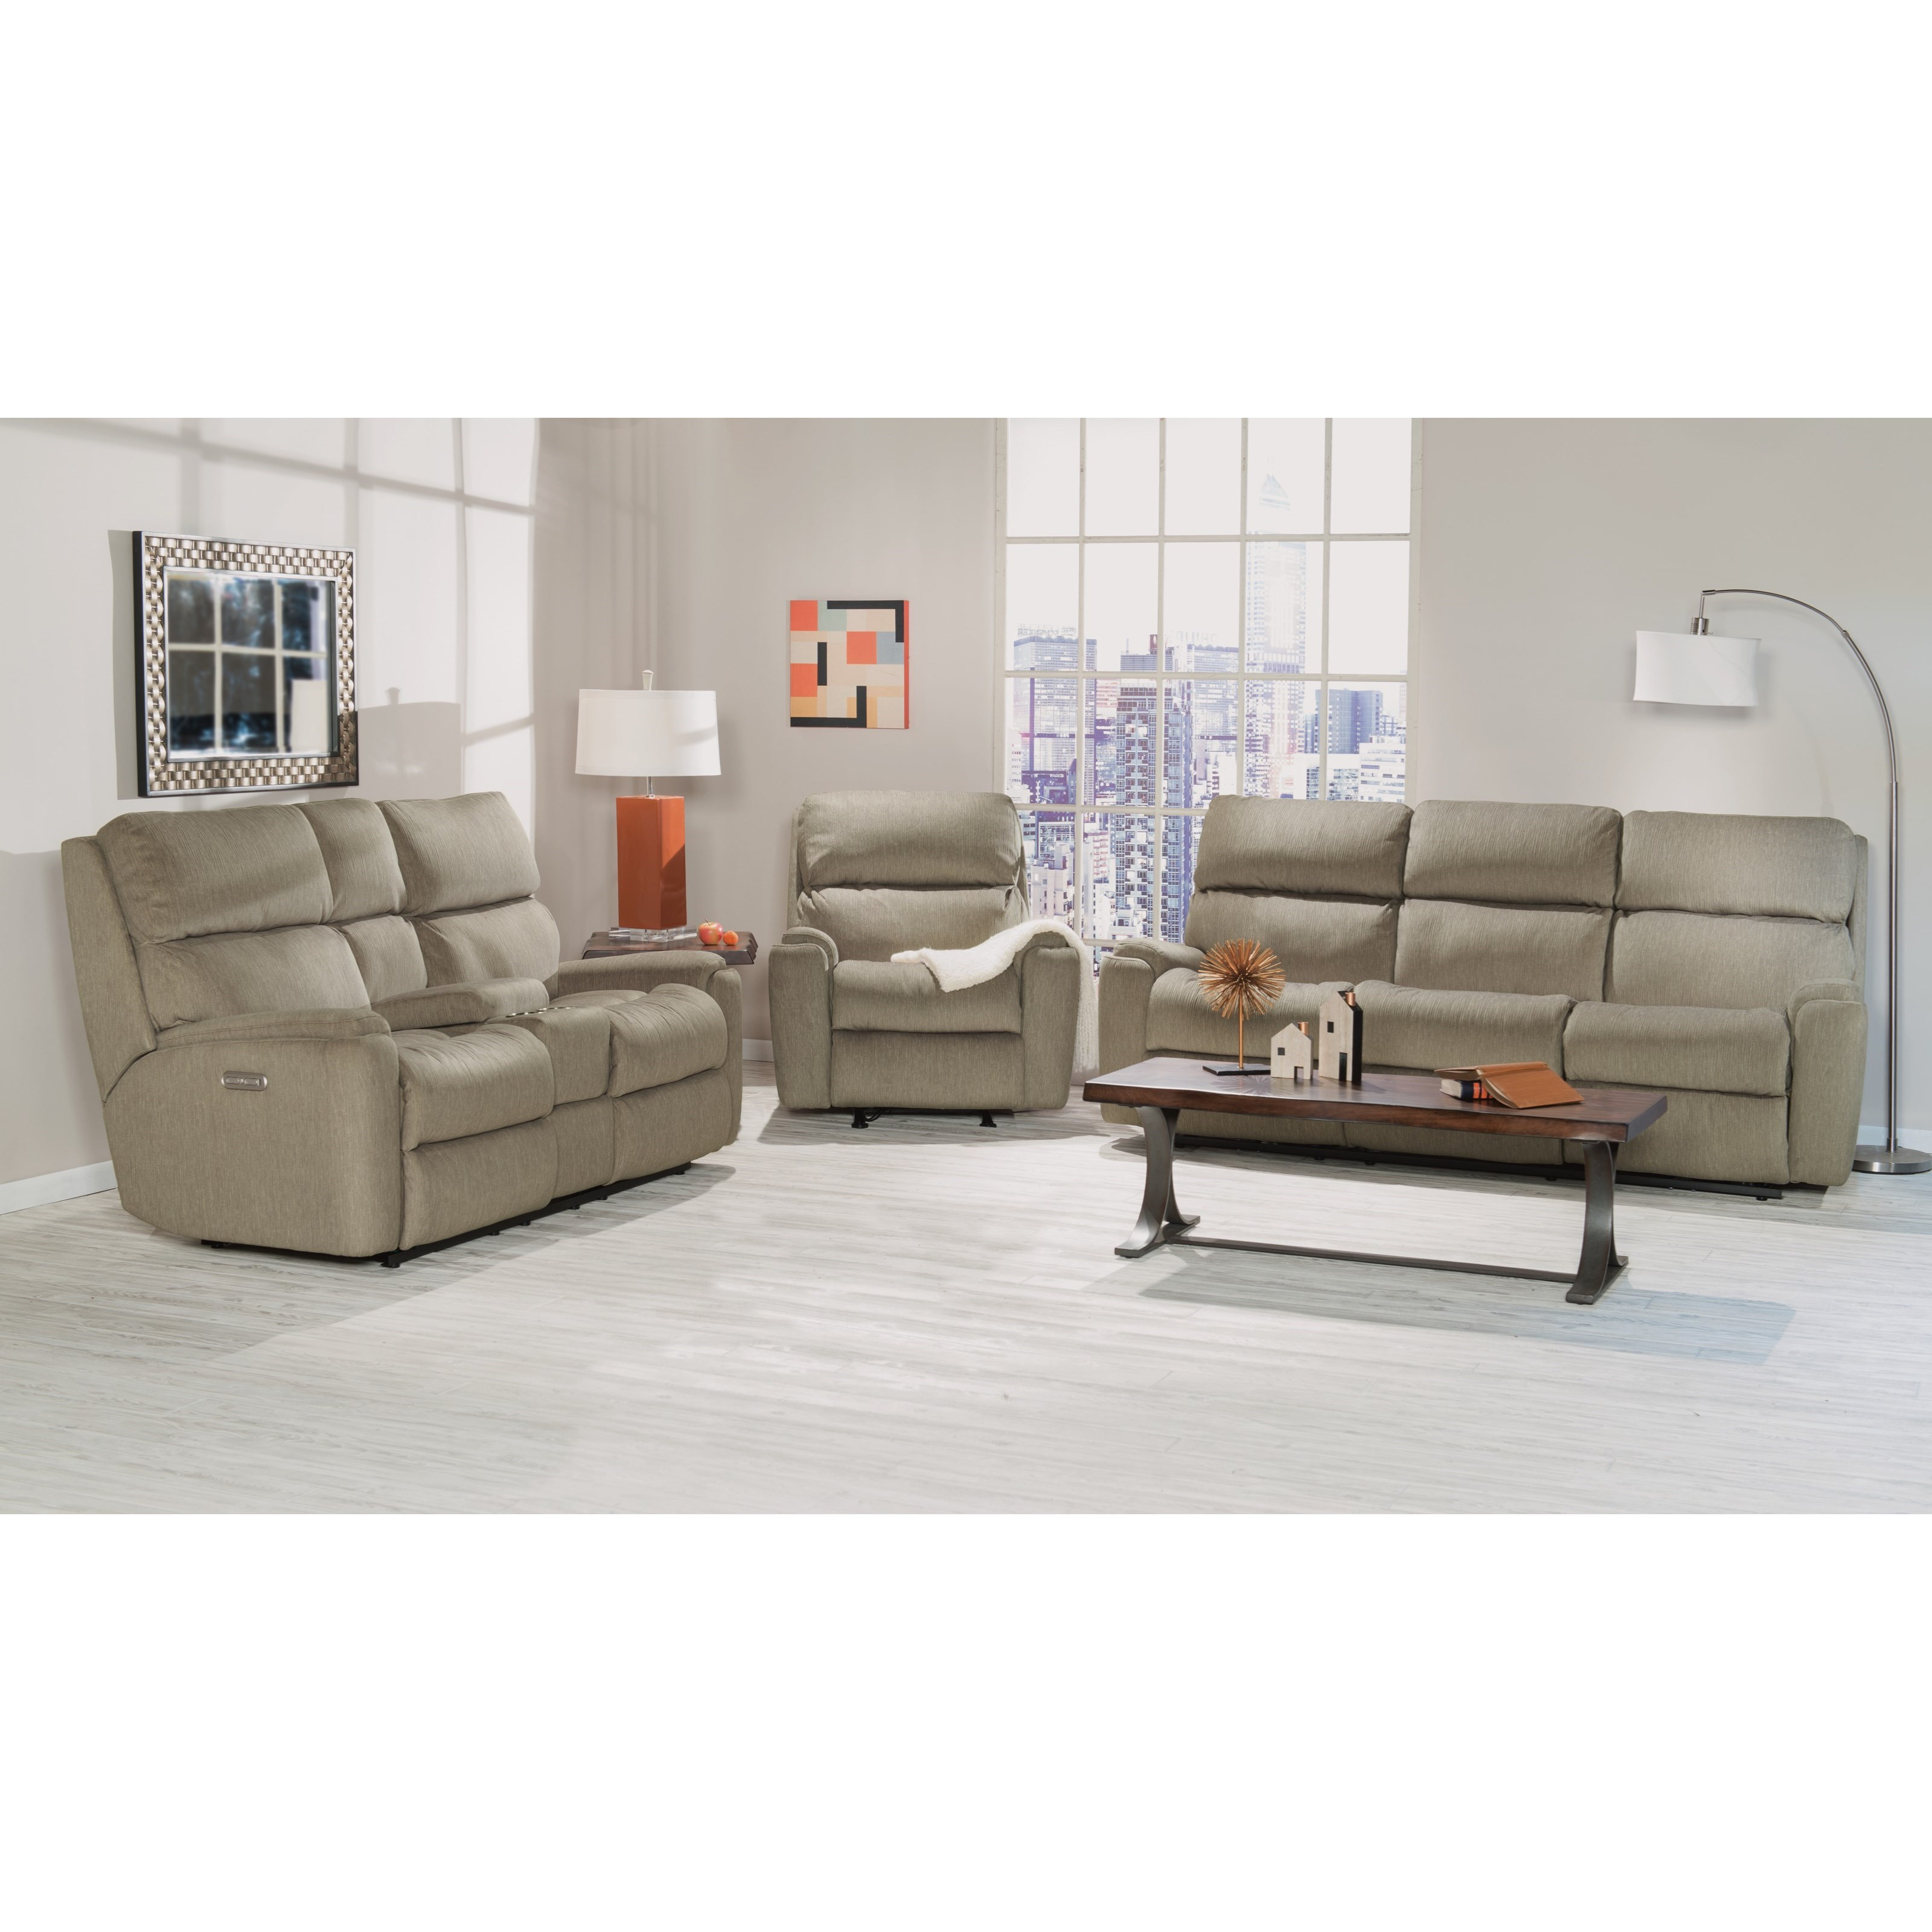 Valor Living Room Group Flexsteel Valor by Flexsteel at Crowley Furniture & Mattress